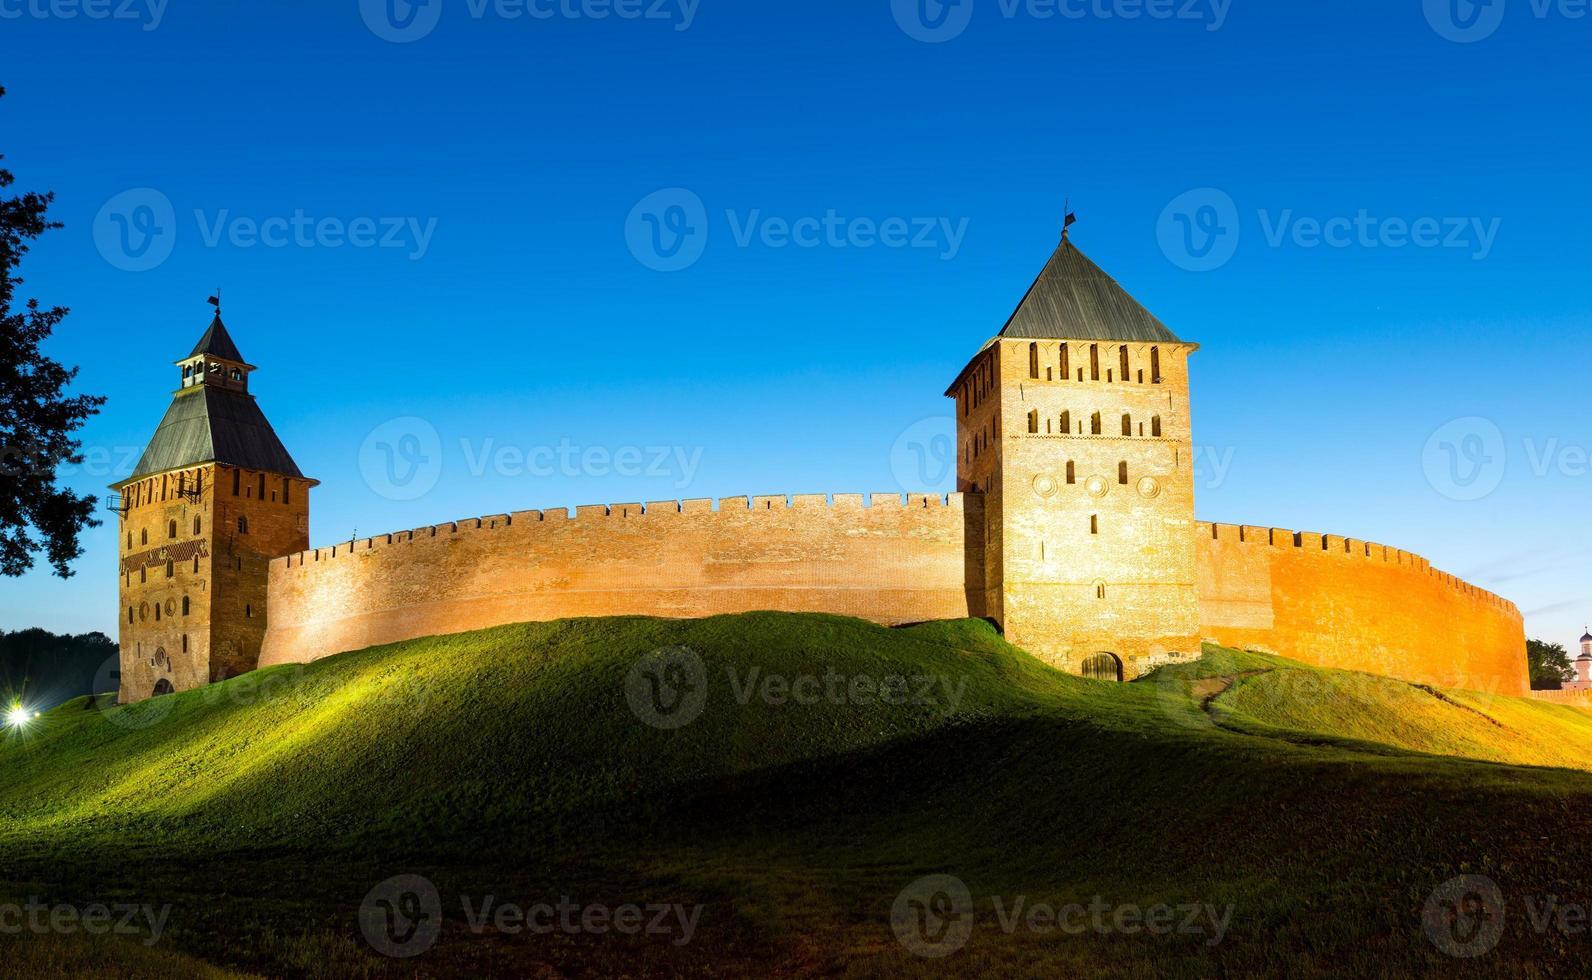 The Kremlin walls in Novgorod the Great photo